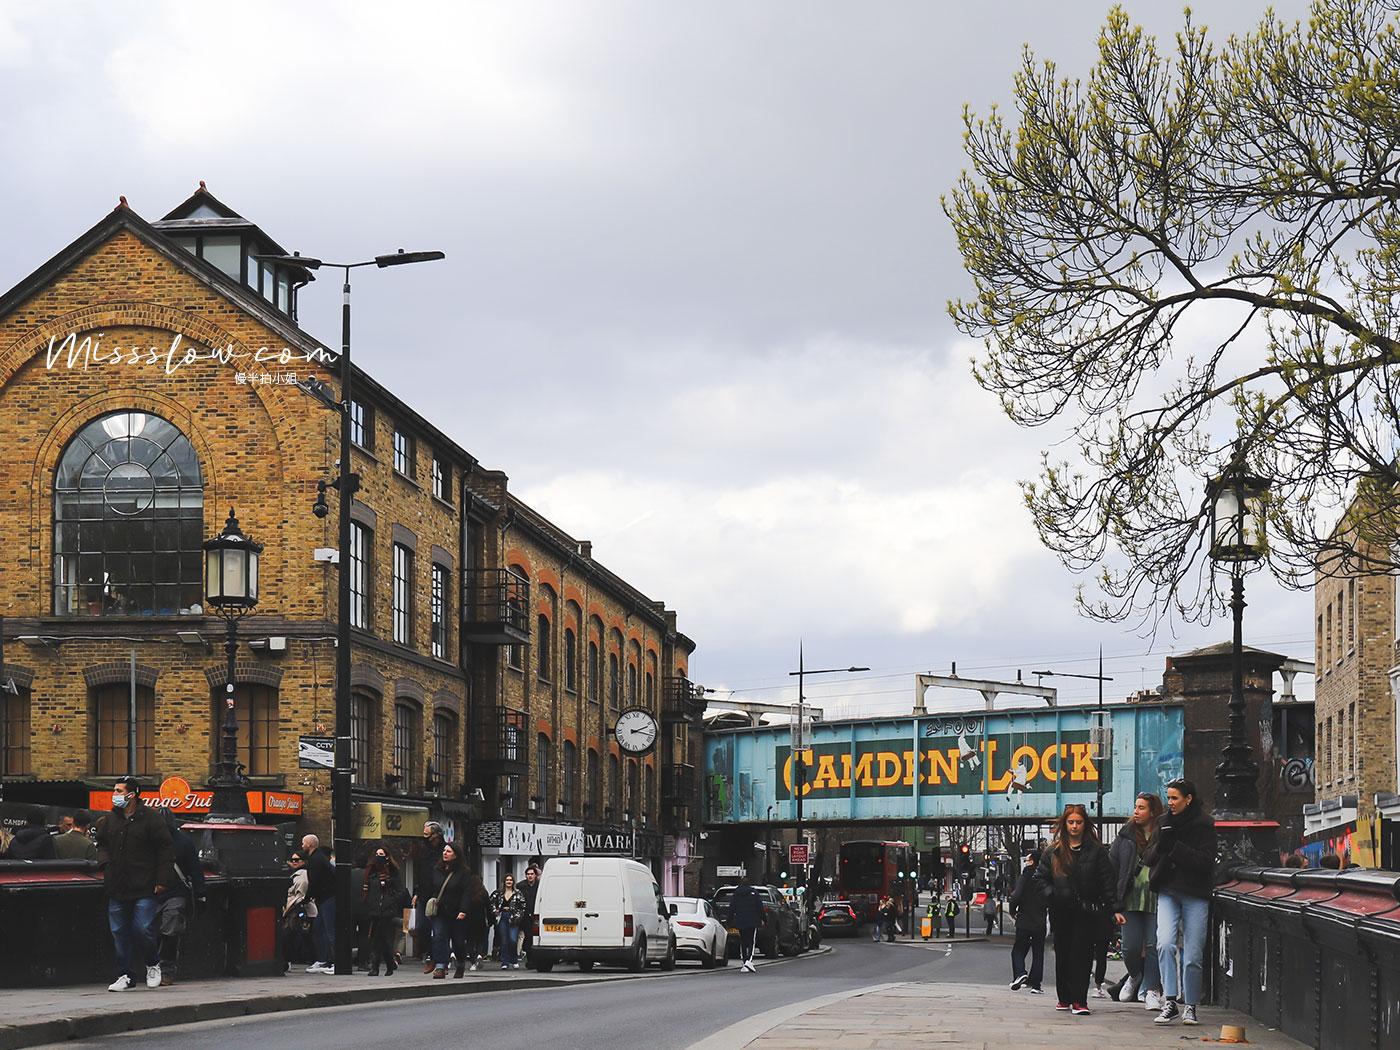 Camden Market肯頓市集 看到這座鐵橋,代表市集快要到了!